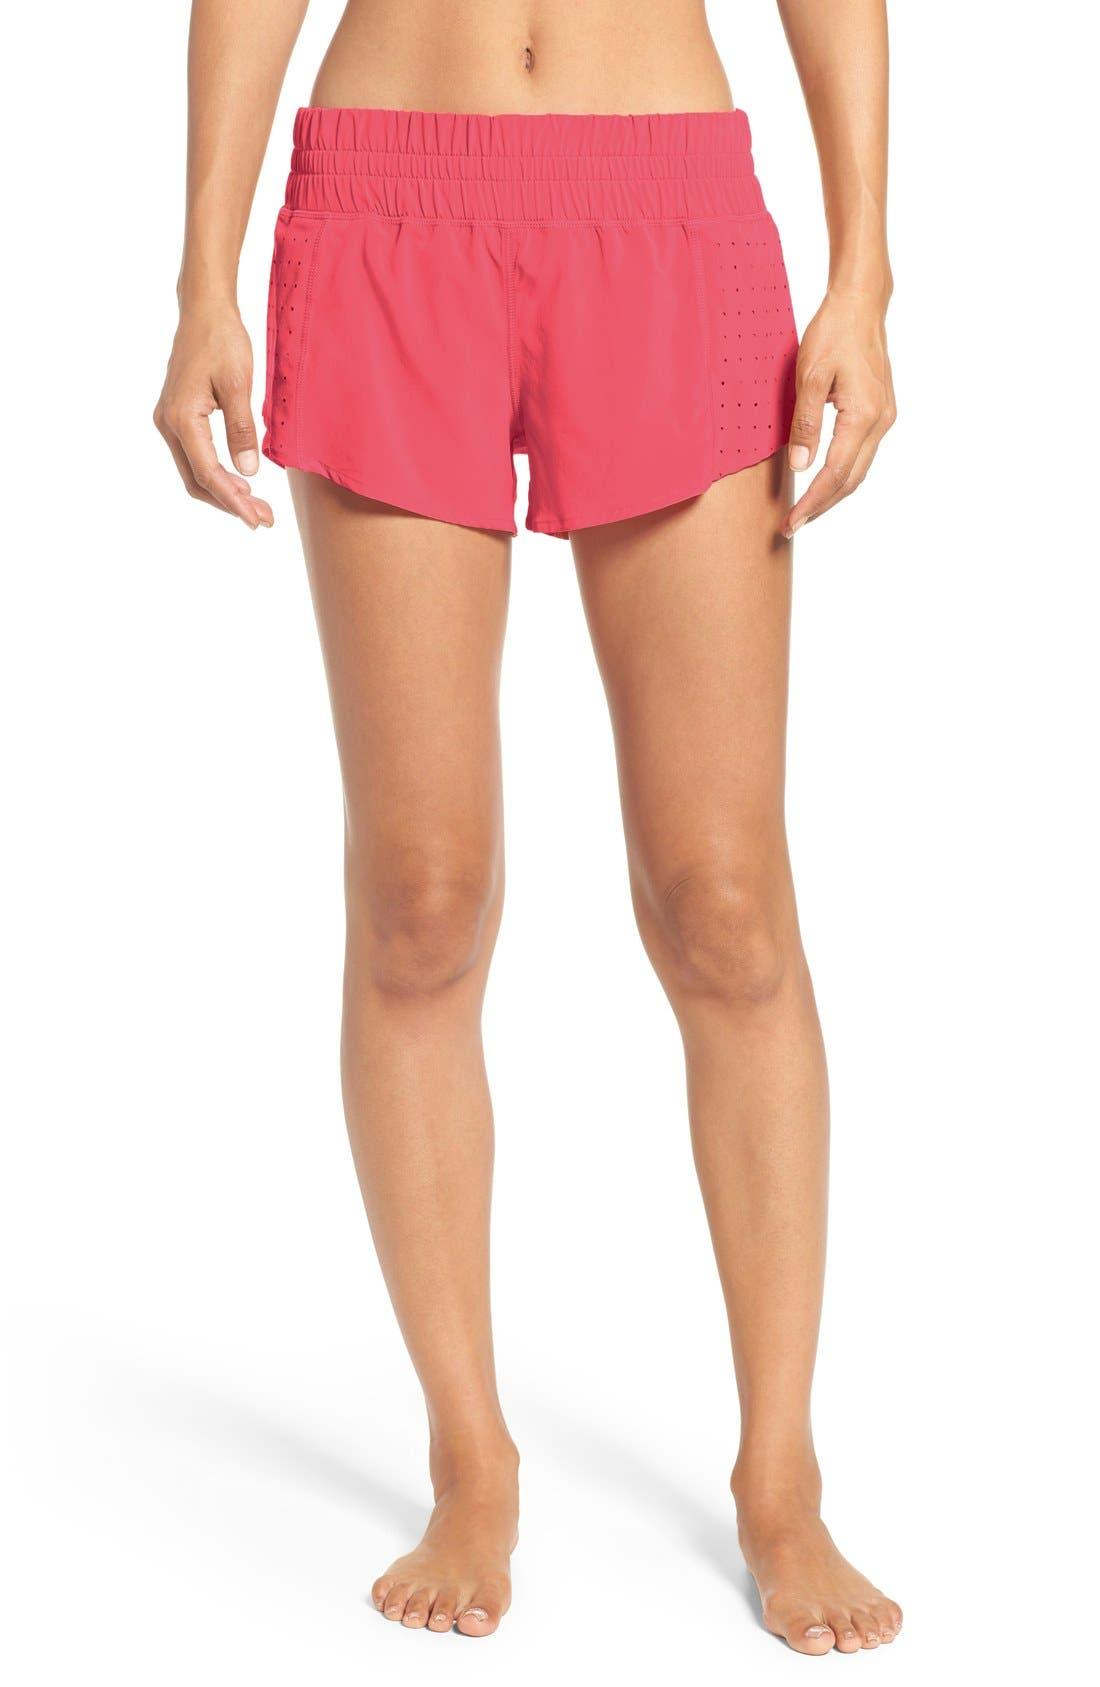 Alternate Image 1 Selected - Zella 'Daylight' Perforated Shorts